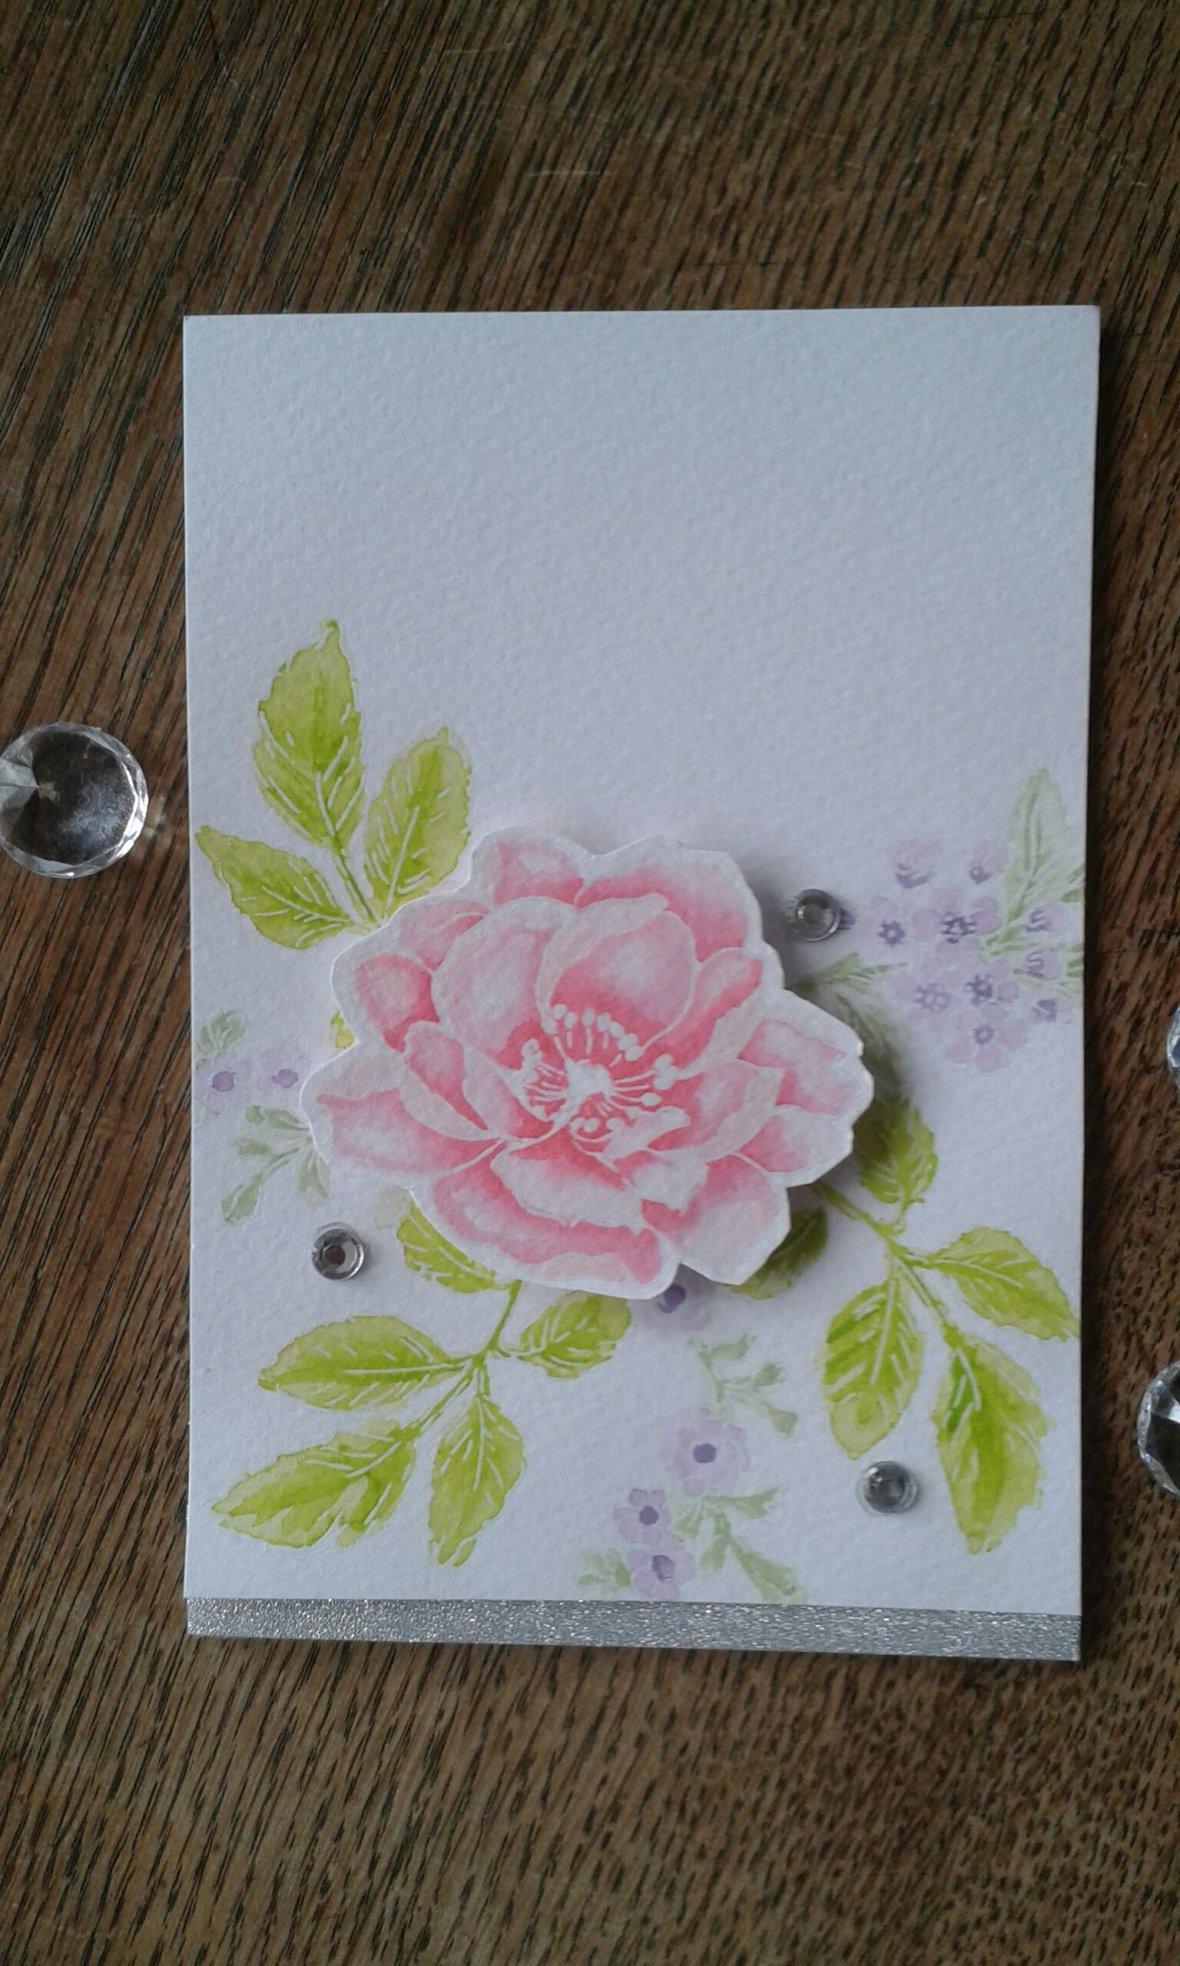 Altenew Beautiful Day watercolour stamping.